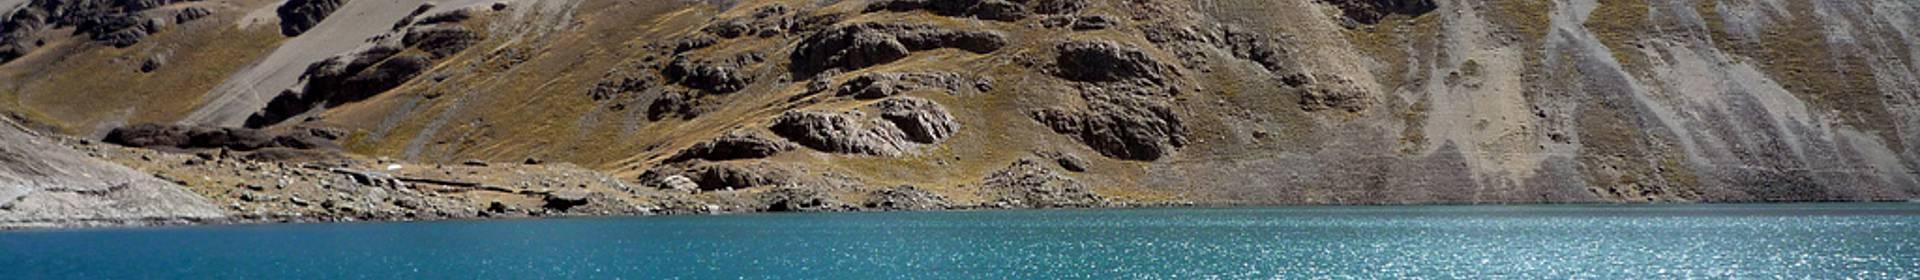 Lagune Huecrococha